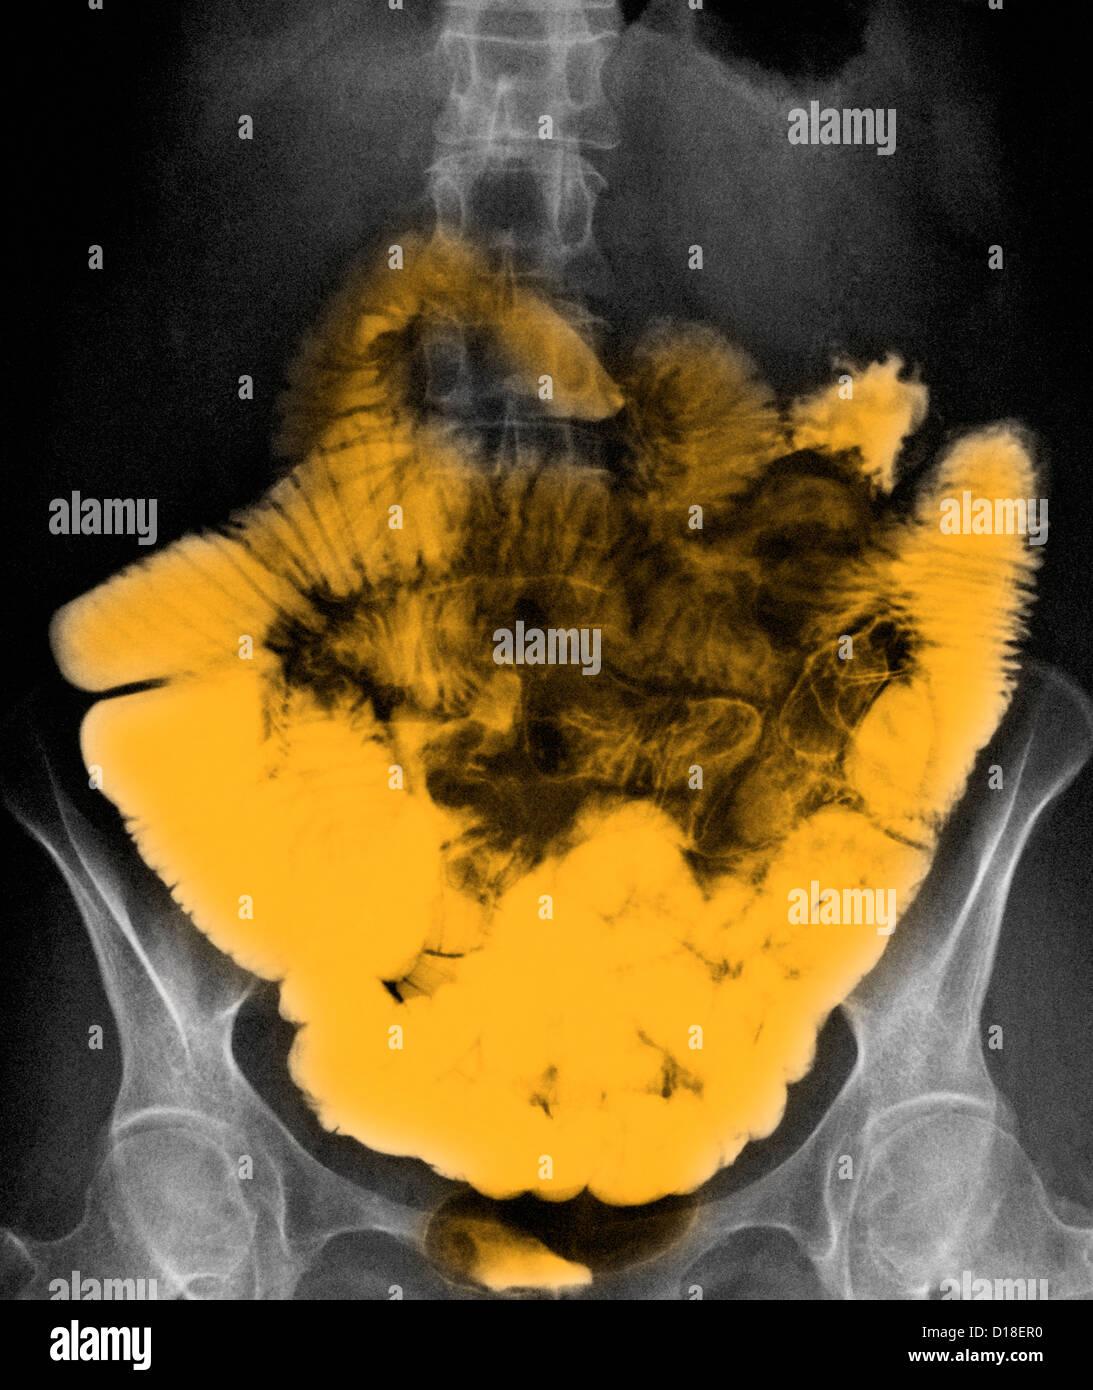 L'intestin grêle normal contraste baryté radiographie abdominale Banque D'Images